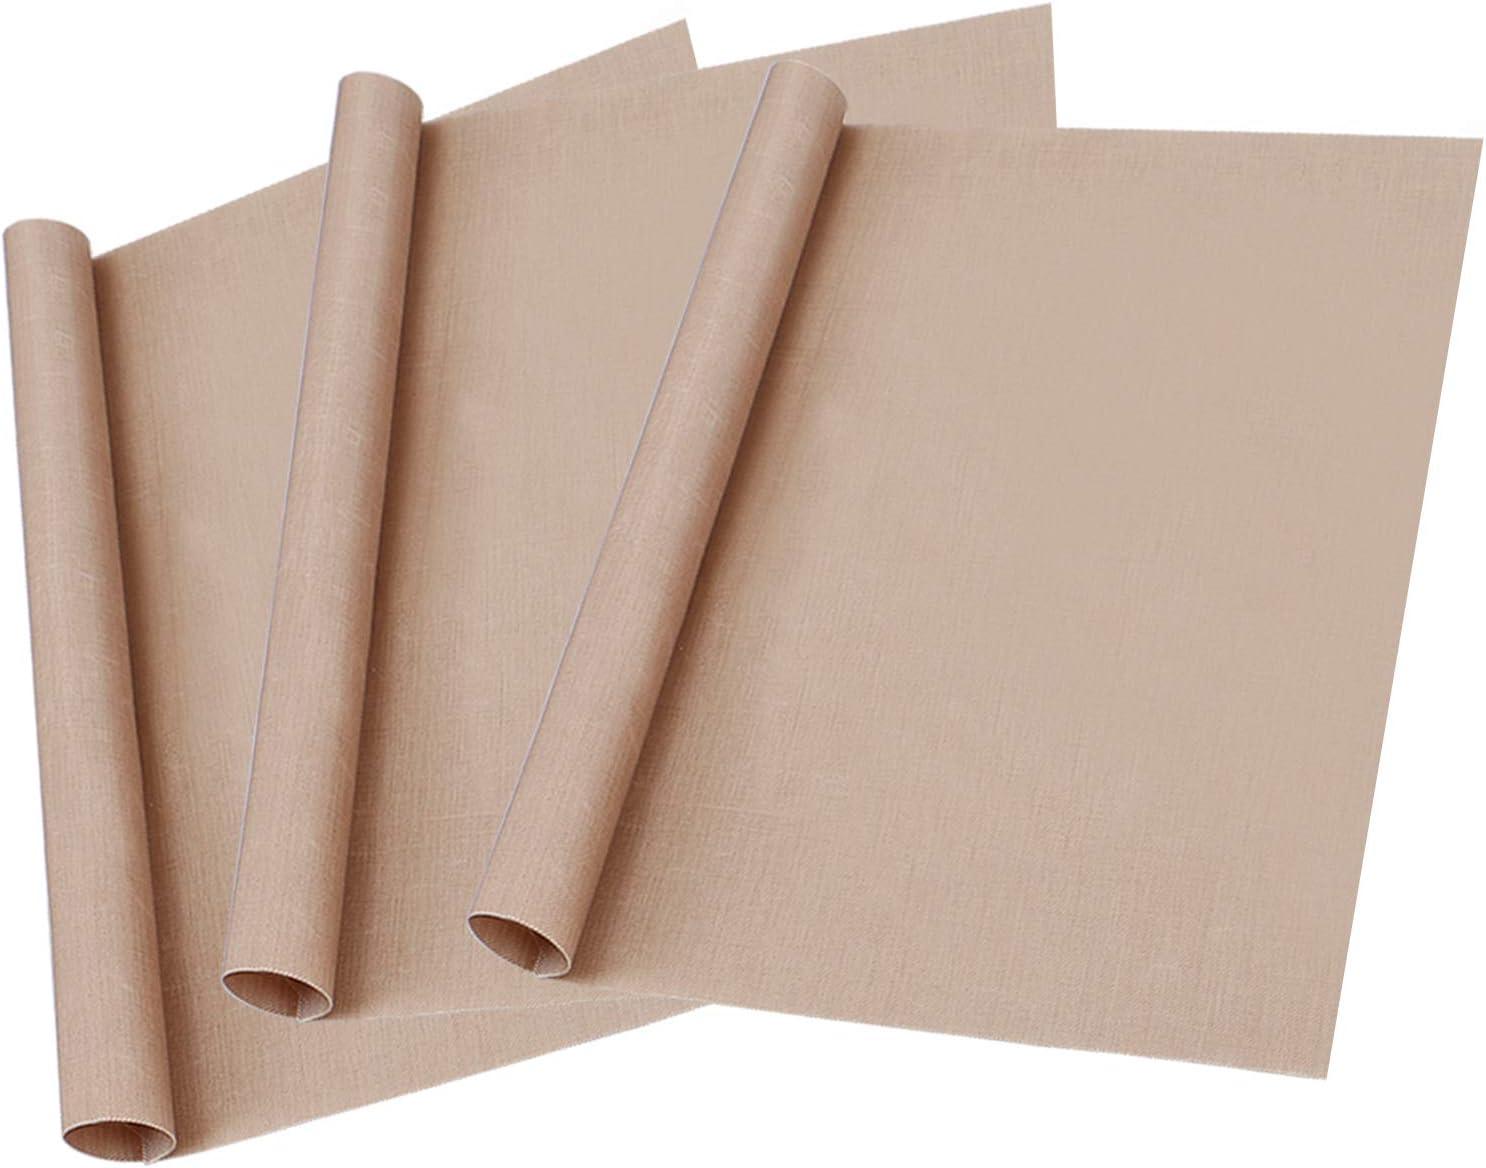 3 Pack PTFE Teflon Sheet for Heat Press Transfer Sheet Non Stick 12